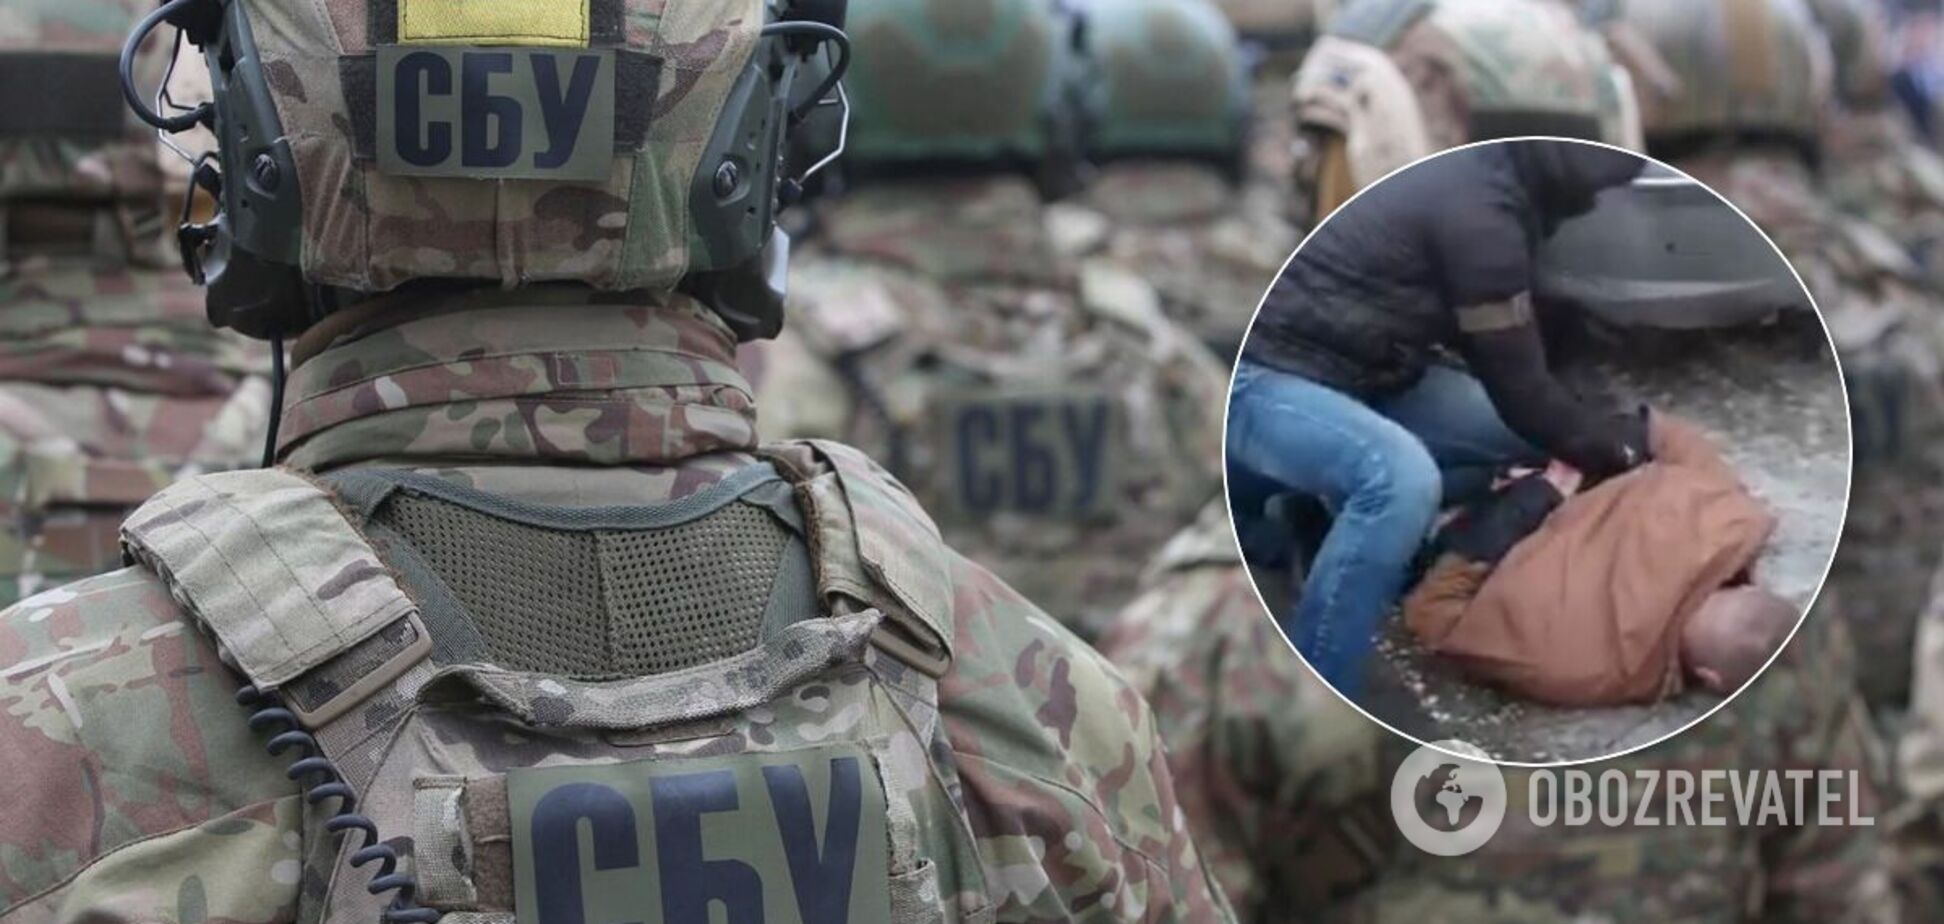 СБУ затримала на хабарі поліцейських